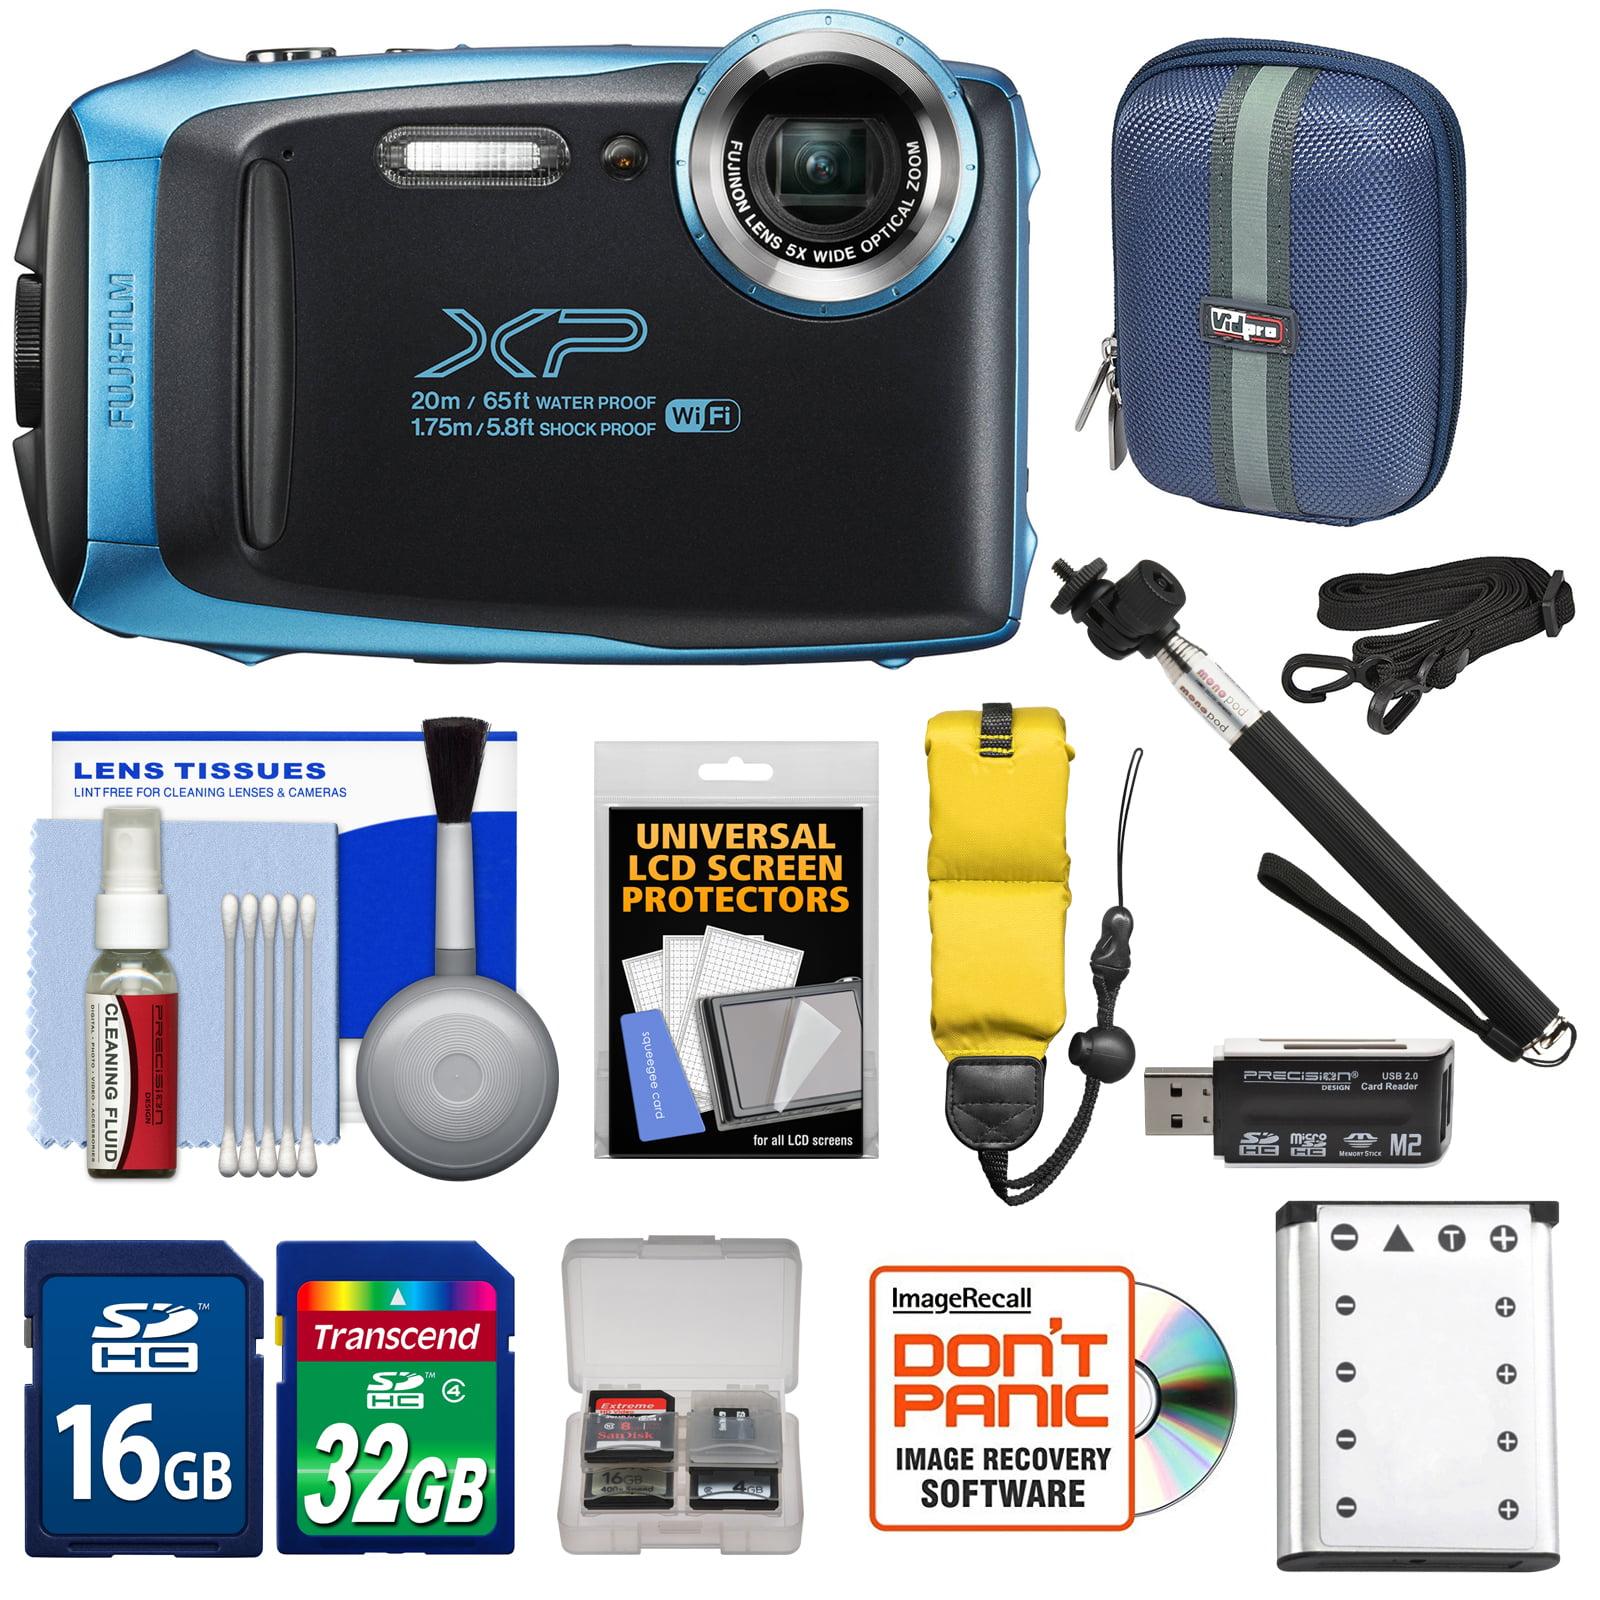 Fujifilm FinePix XP130 Shock & Waterproof Wi-Fi Digital Camera (White) with 32GB Card + Battery + Cases + Float Strap + Selfie Stick + Kit